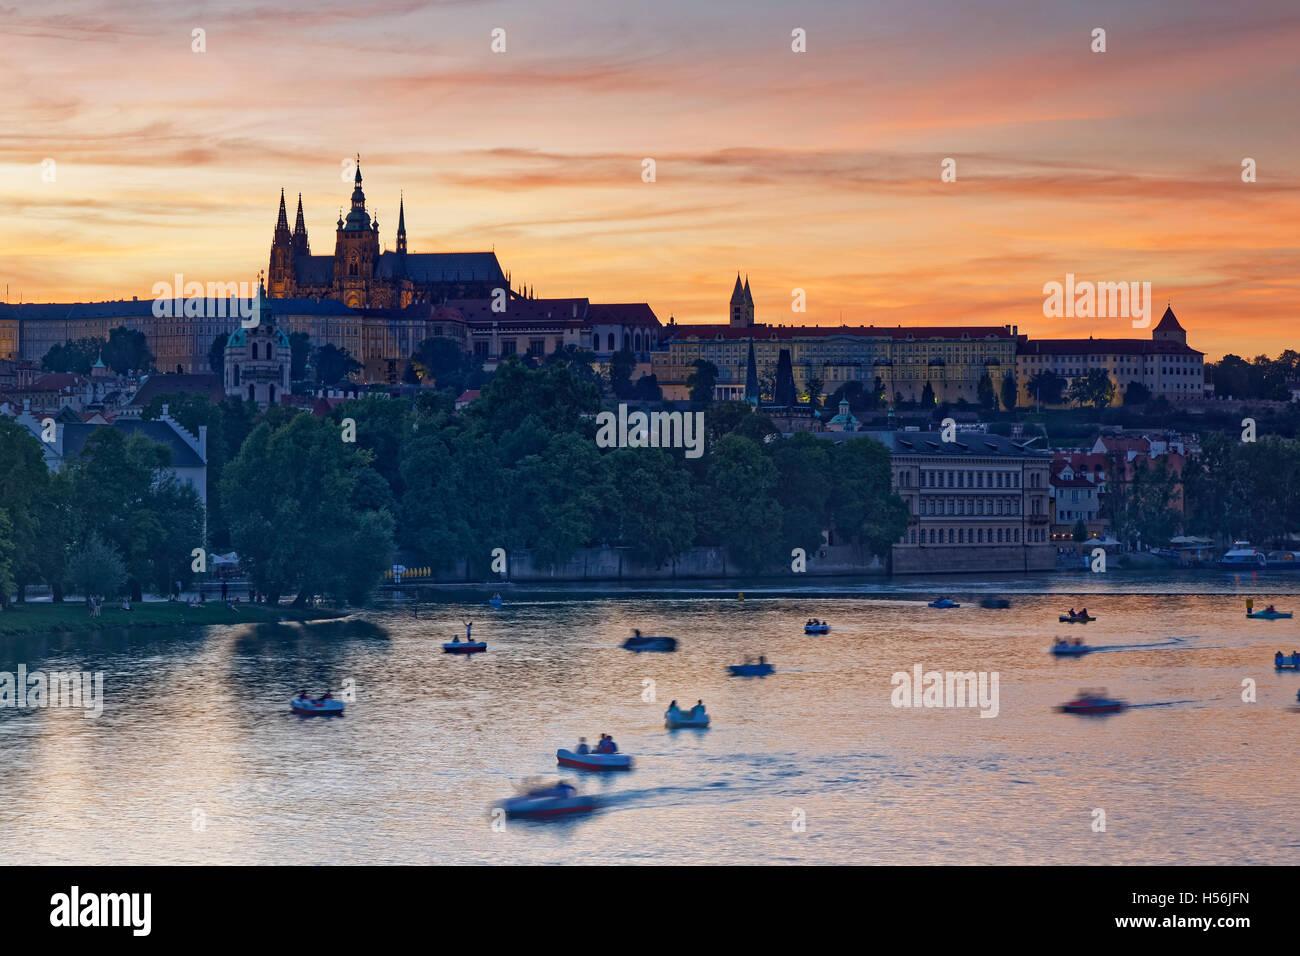 Prazsky hrad, Prague Castle and St. Vitus Cathedral, Hradčany, historic centre Praha, Prague, Czech Republic Stock Photo